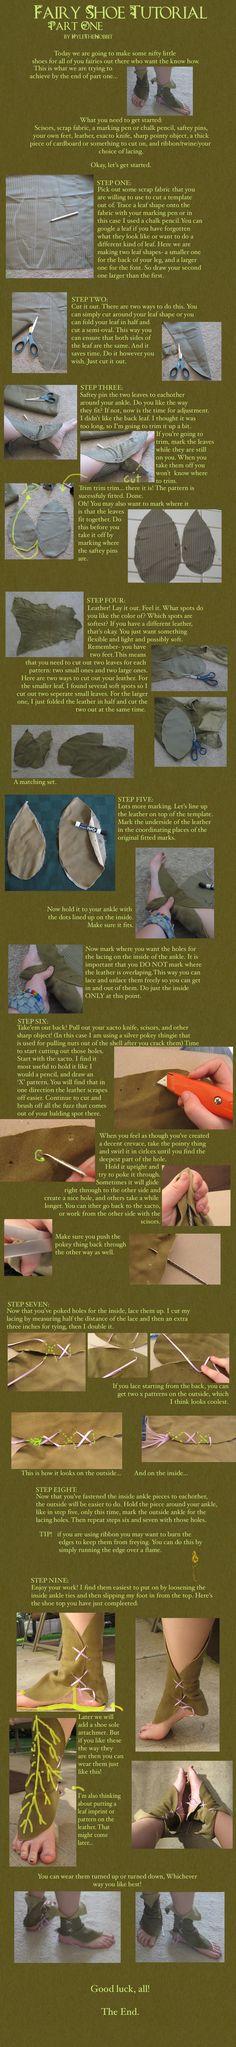 Fairy Shoe Tutorial: Part 1 by KyleTheHobbit